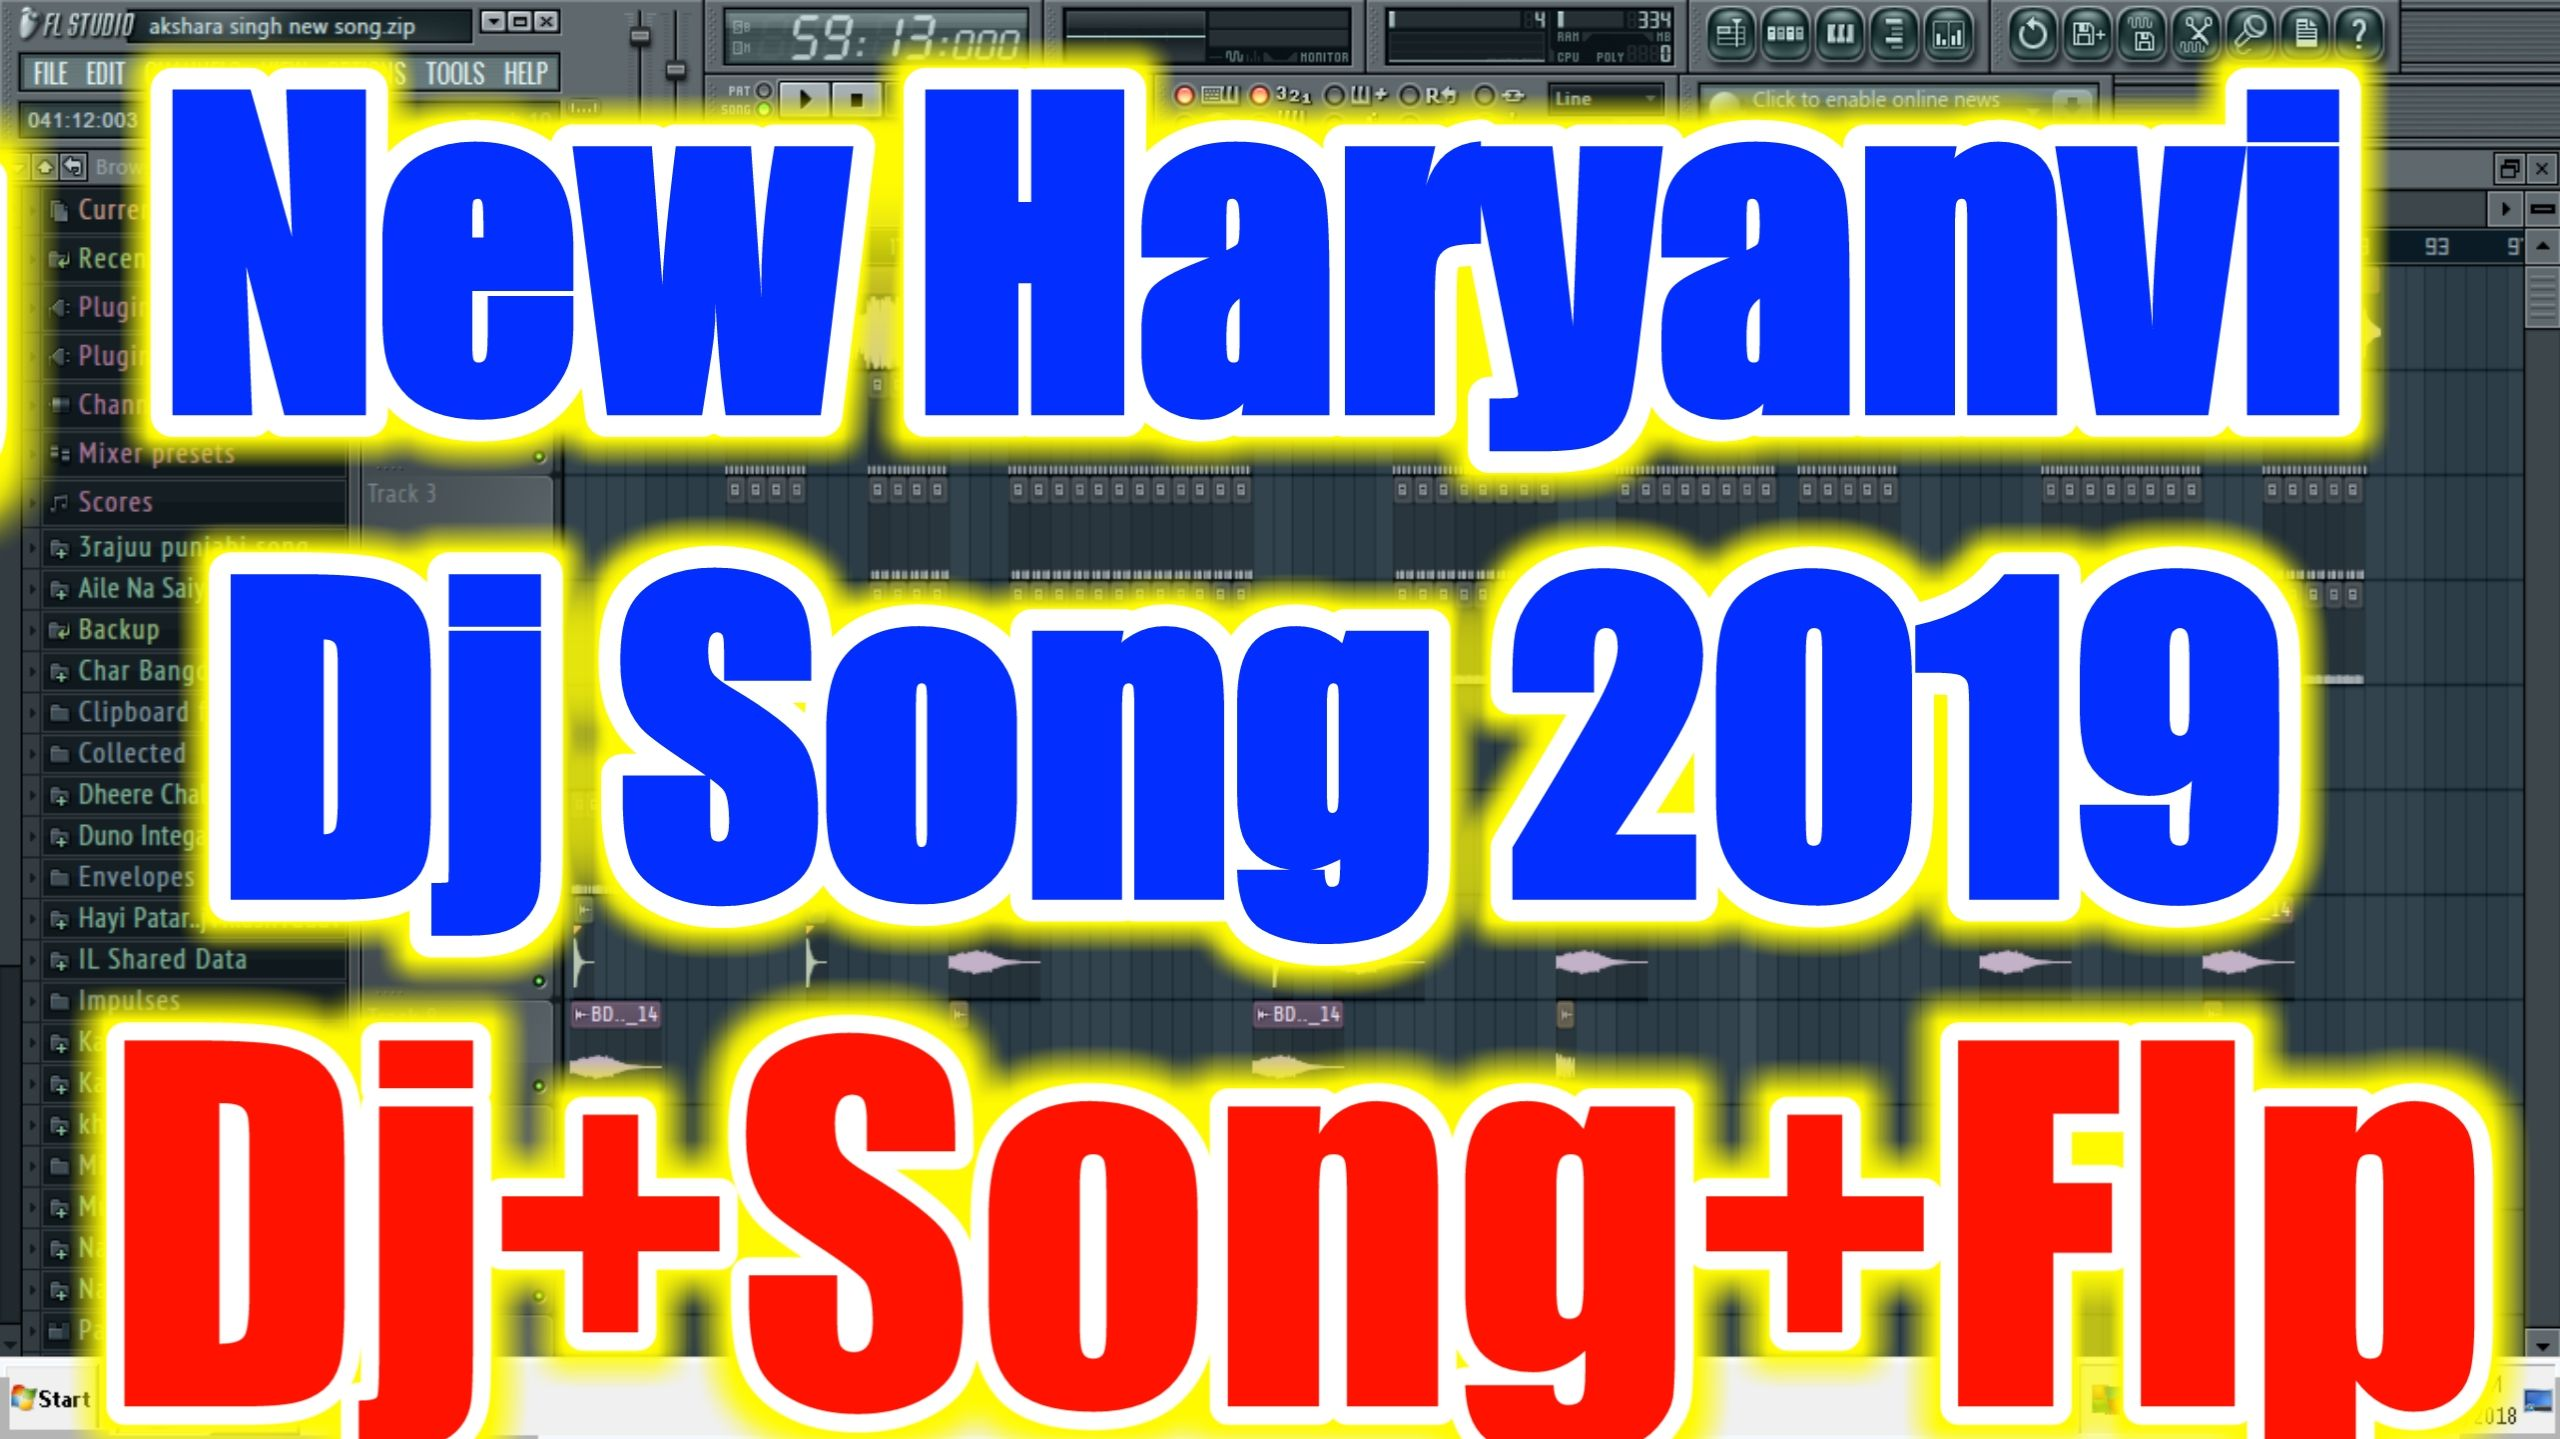 New Haryanvi Song Dj Mp3 Download 2019 Haryanvi Song Flp Project New Haryanvi Dj Song Flp Project Mp3 Song Download Dj Remix Songs Dj Mp3